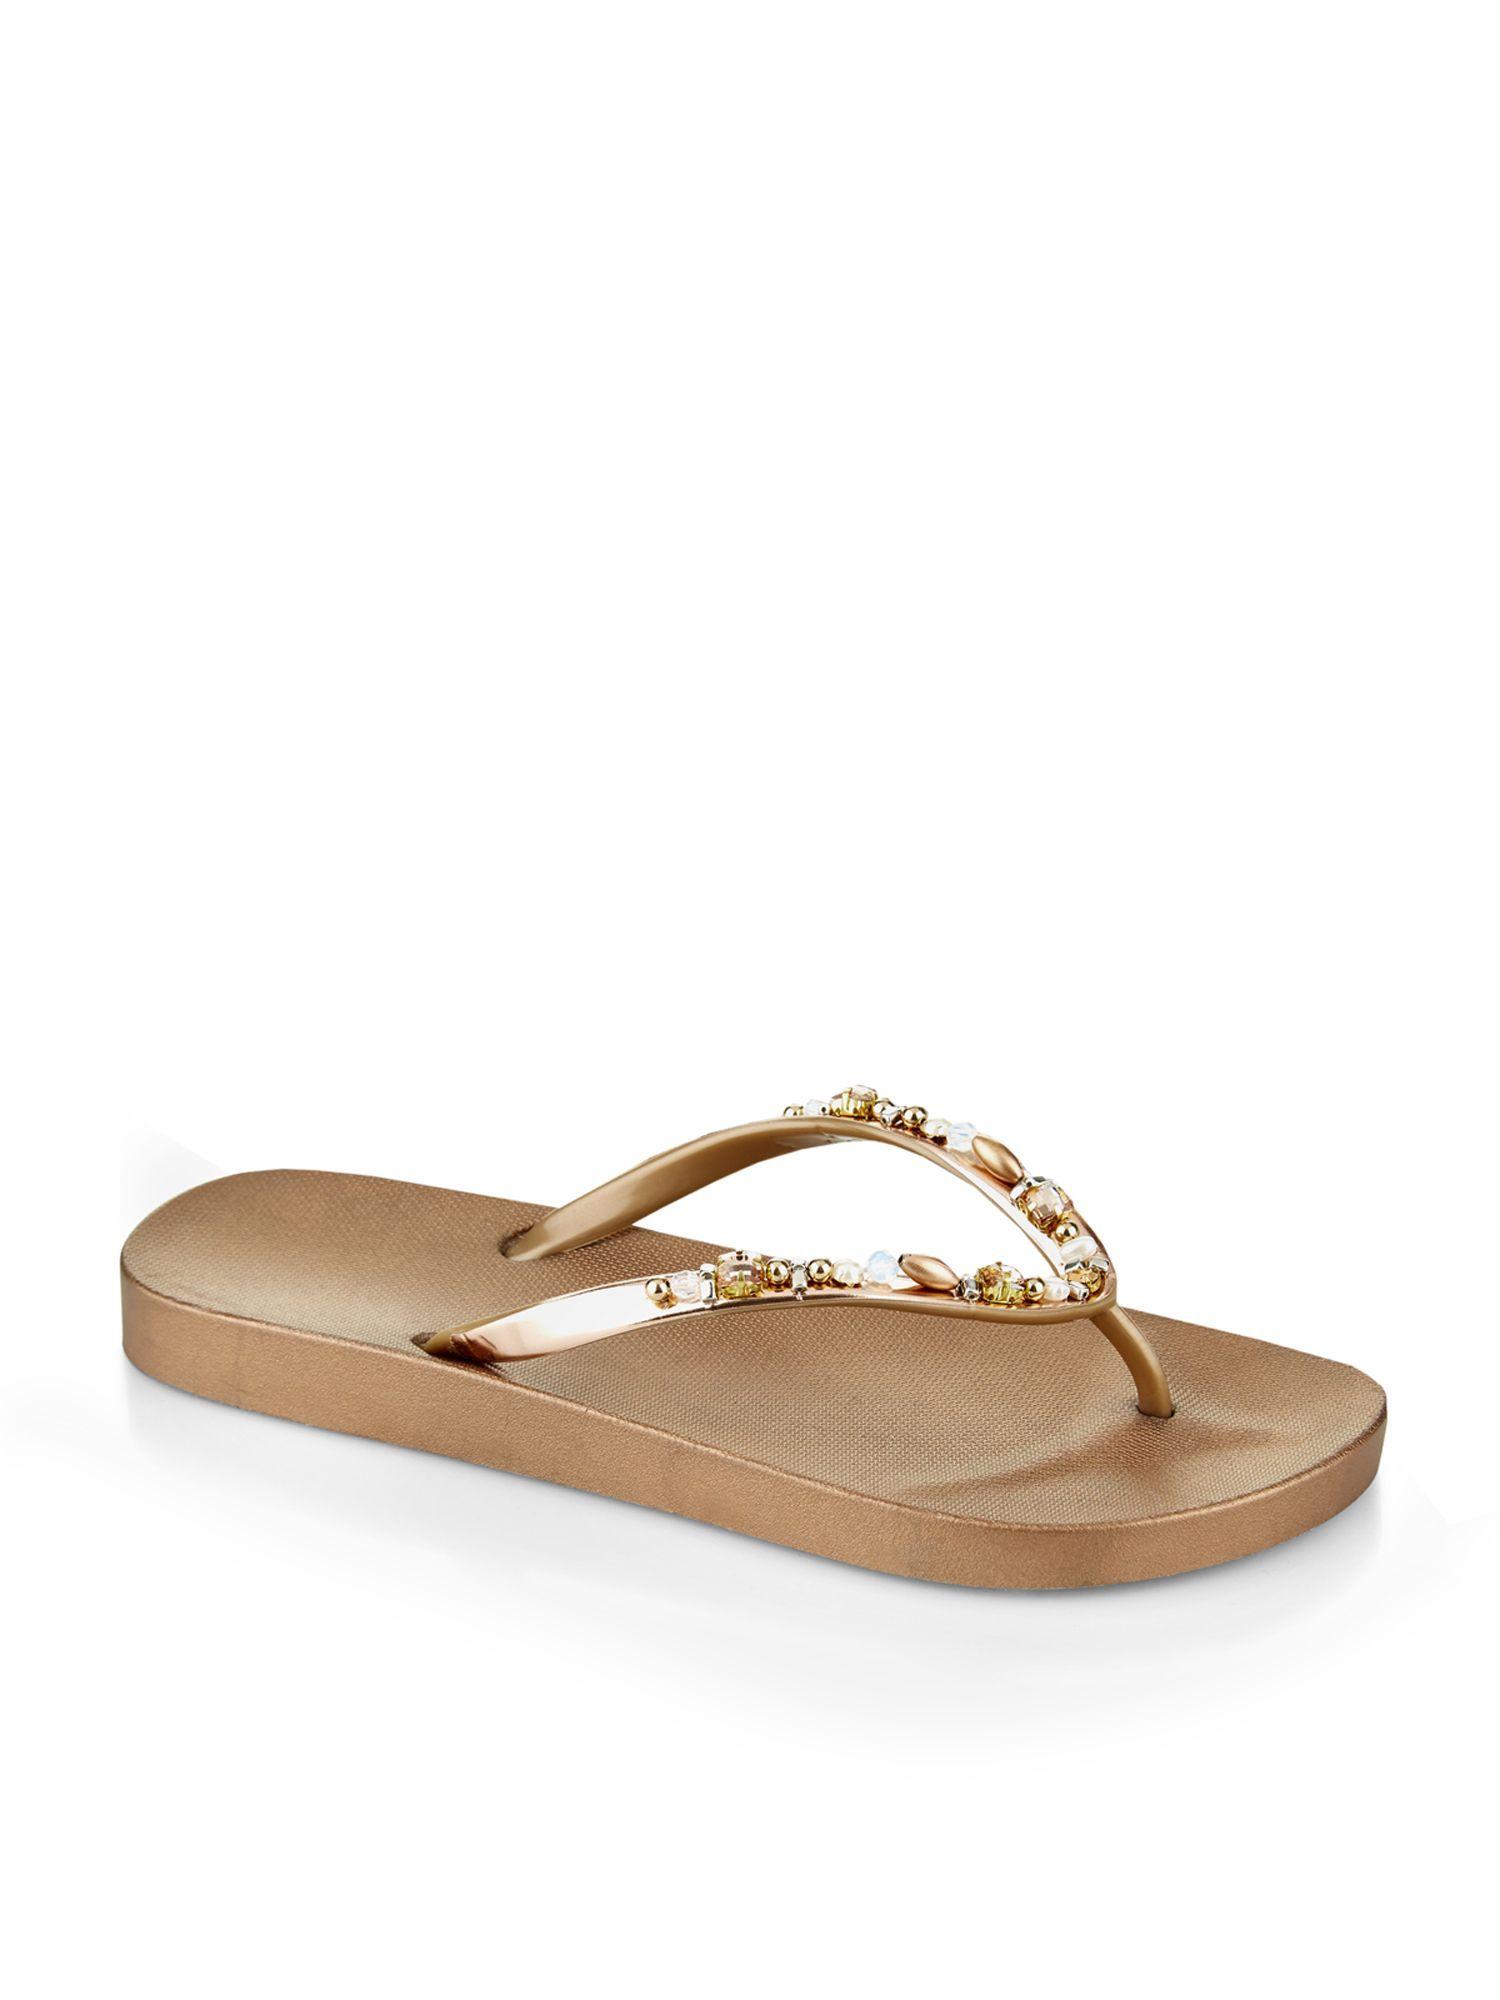 987cb6f622ccb5 Accessorize Irina sparkle eva flip flops